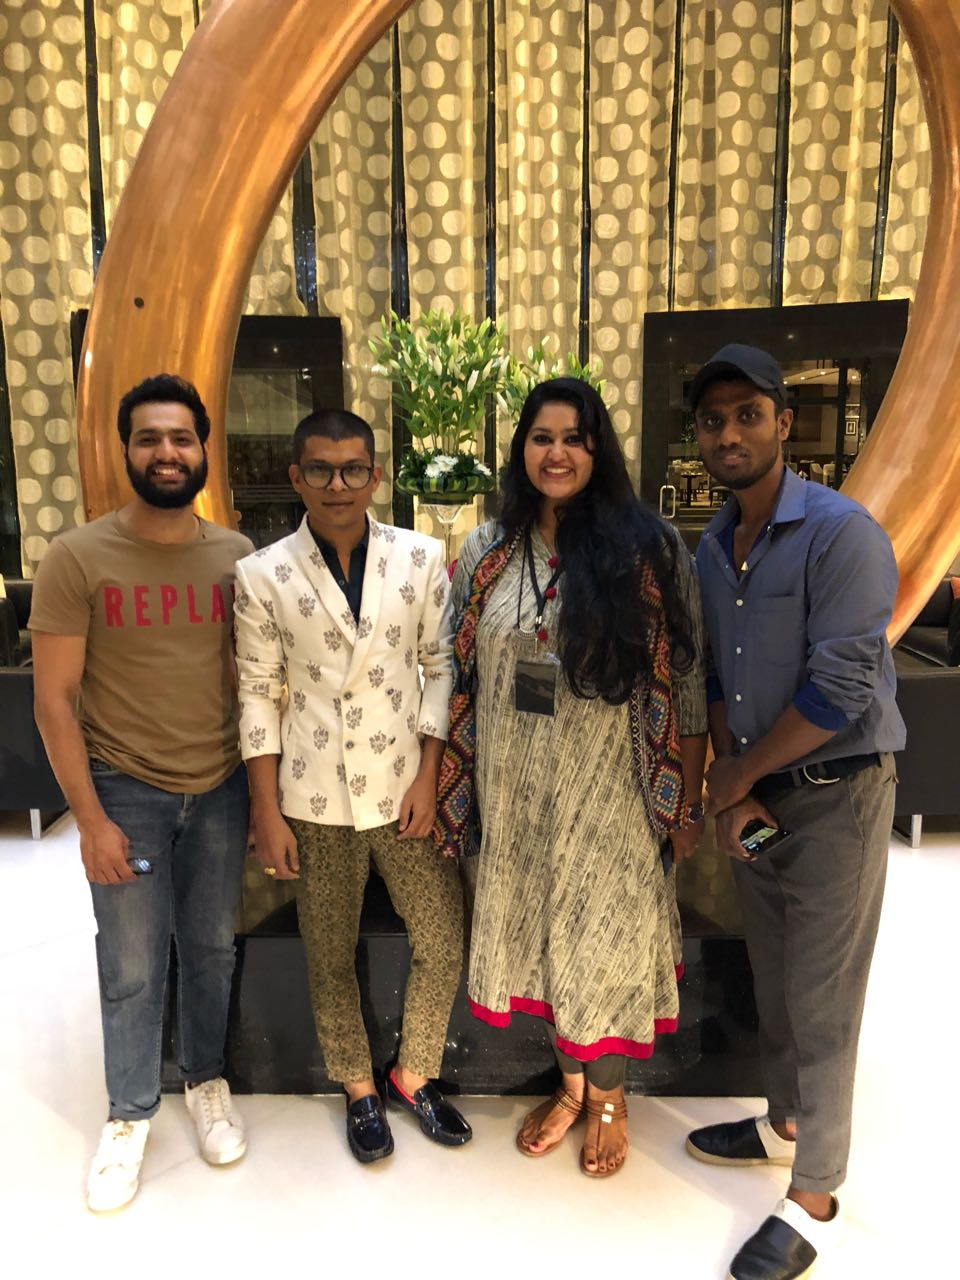 Bangalore fashion week 2018 bangalore fashion week - JEDIIIANS AT WORK BANGALORE FASHION WEEK 2018 1 - JEDIIIANS AT WORK; BANGALORE FASHION WEEK 2018